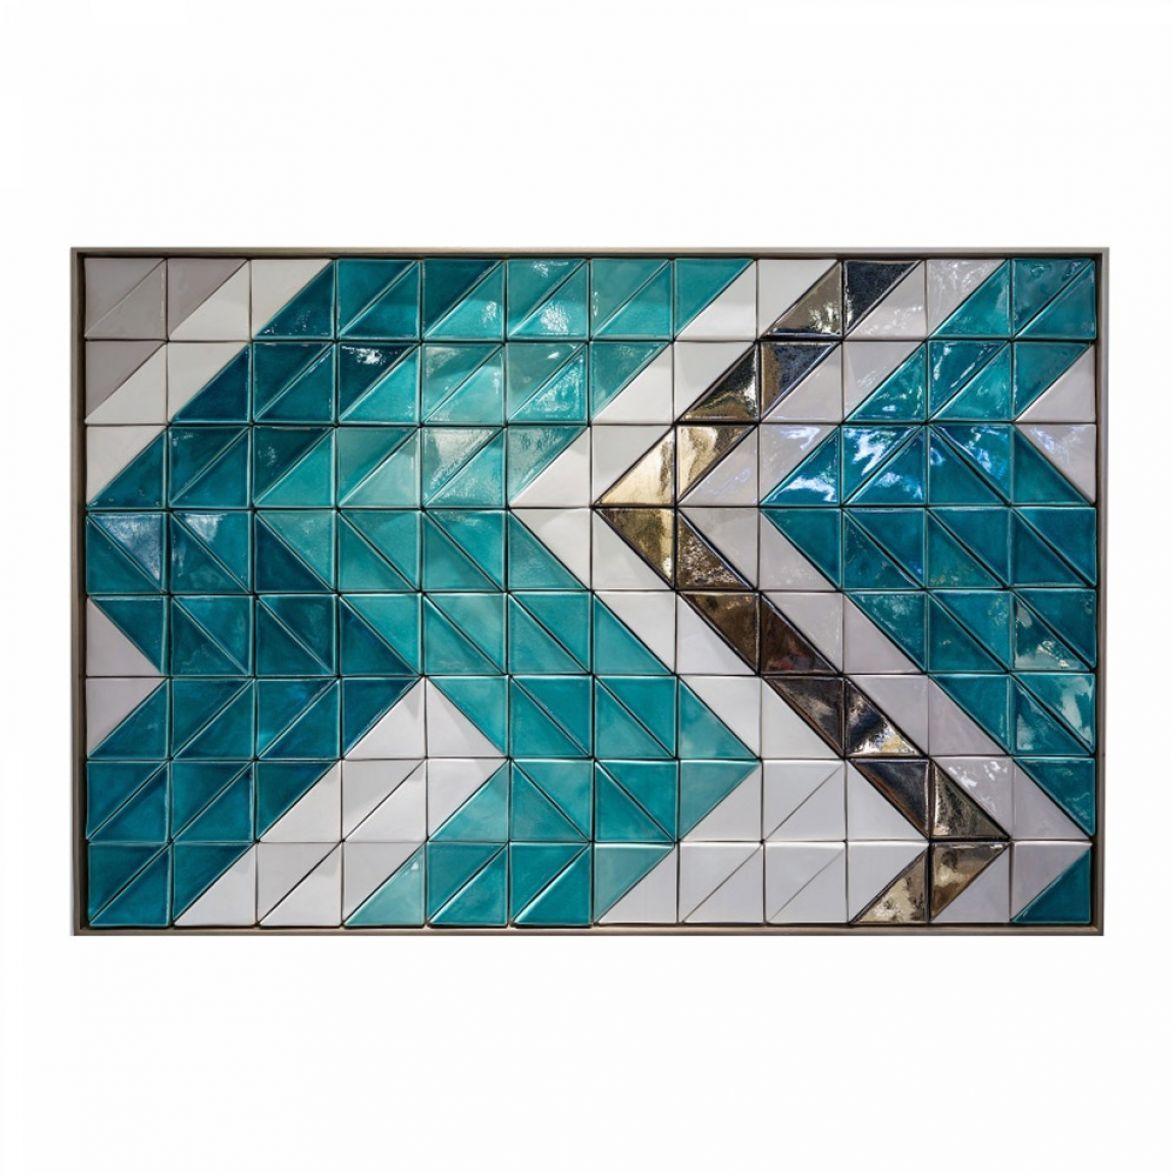 Tejo colors Tiles Panel